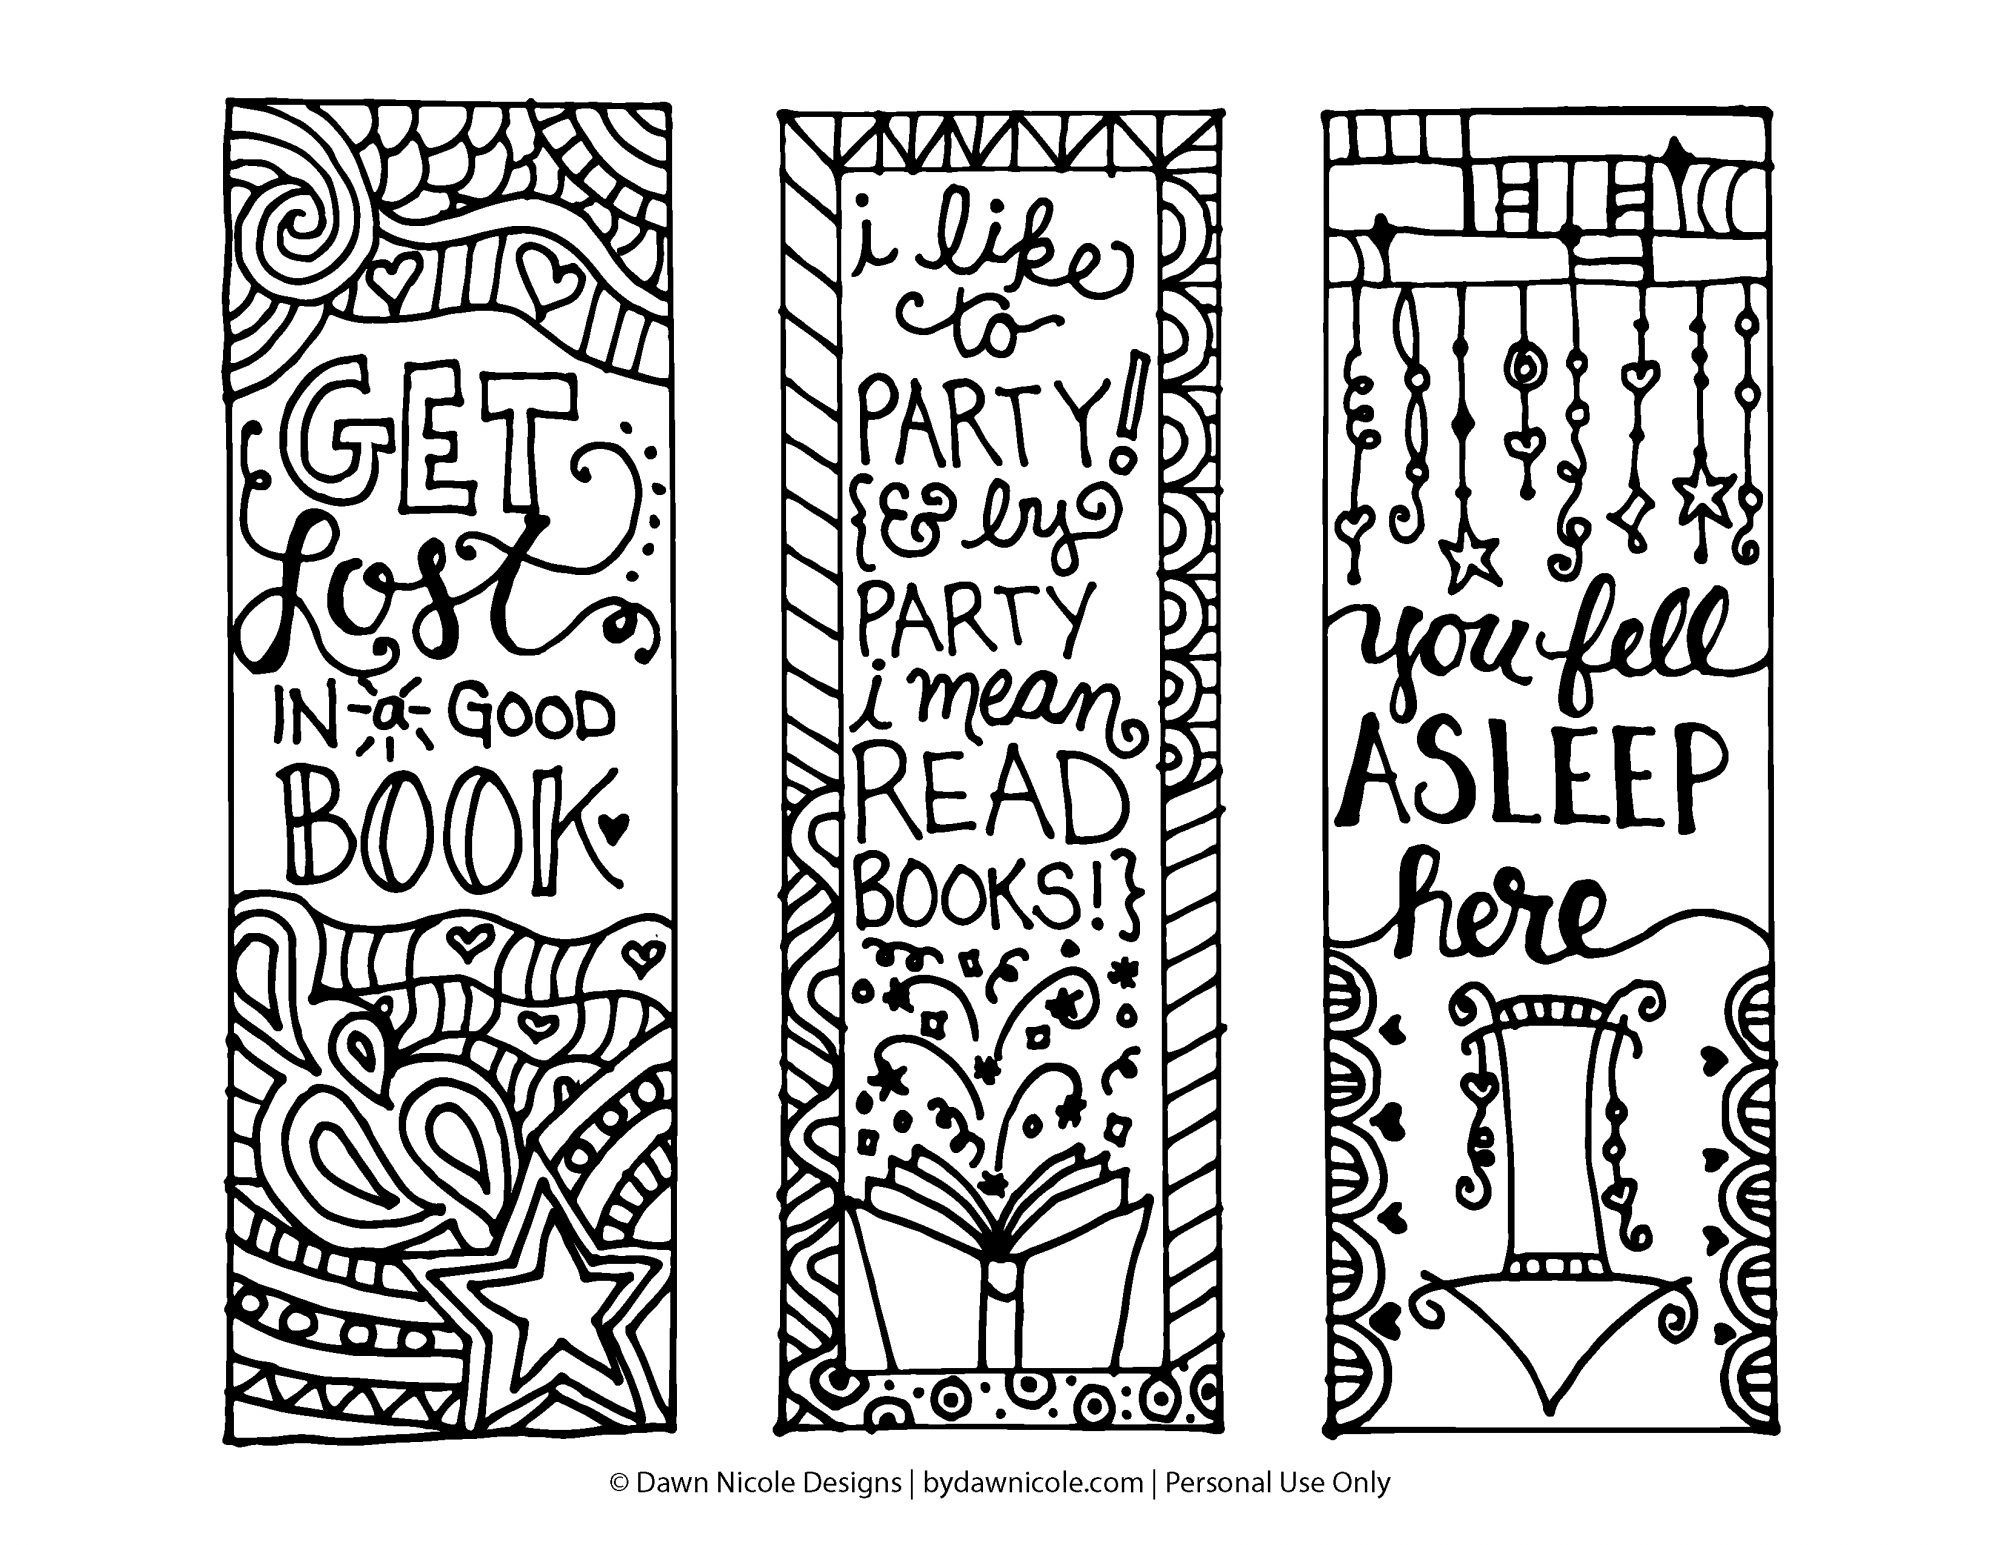 Pinxandra Black On Print Now | Free Printable Bookmarks, Adult - Free Printable Bookmarks To Color